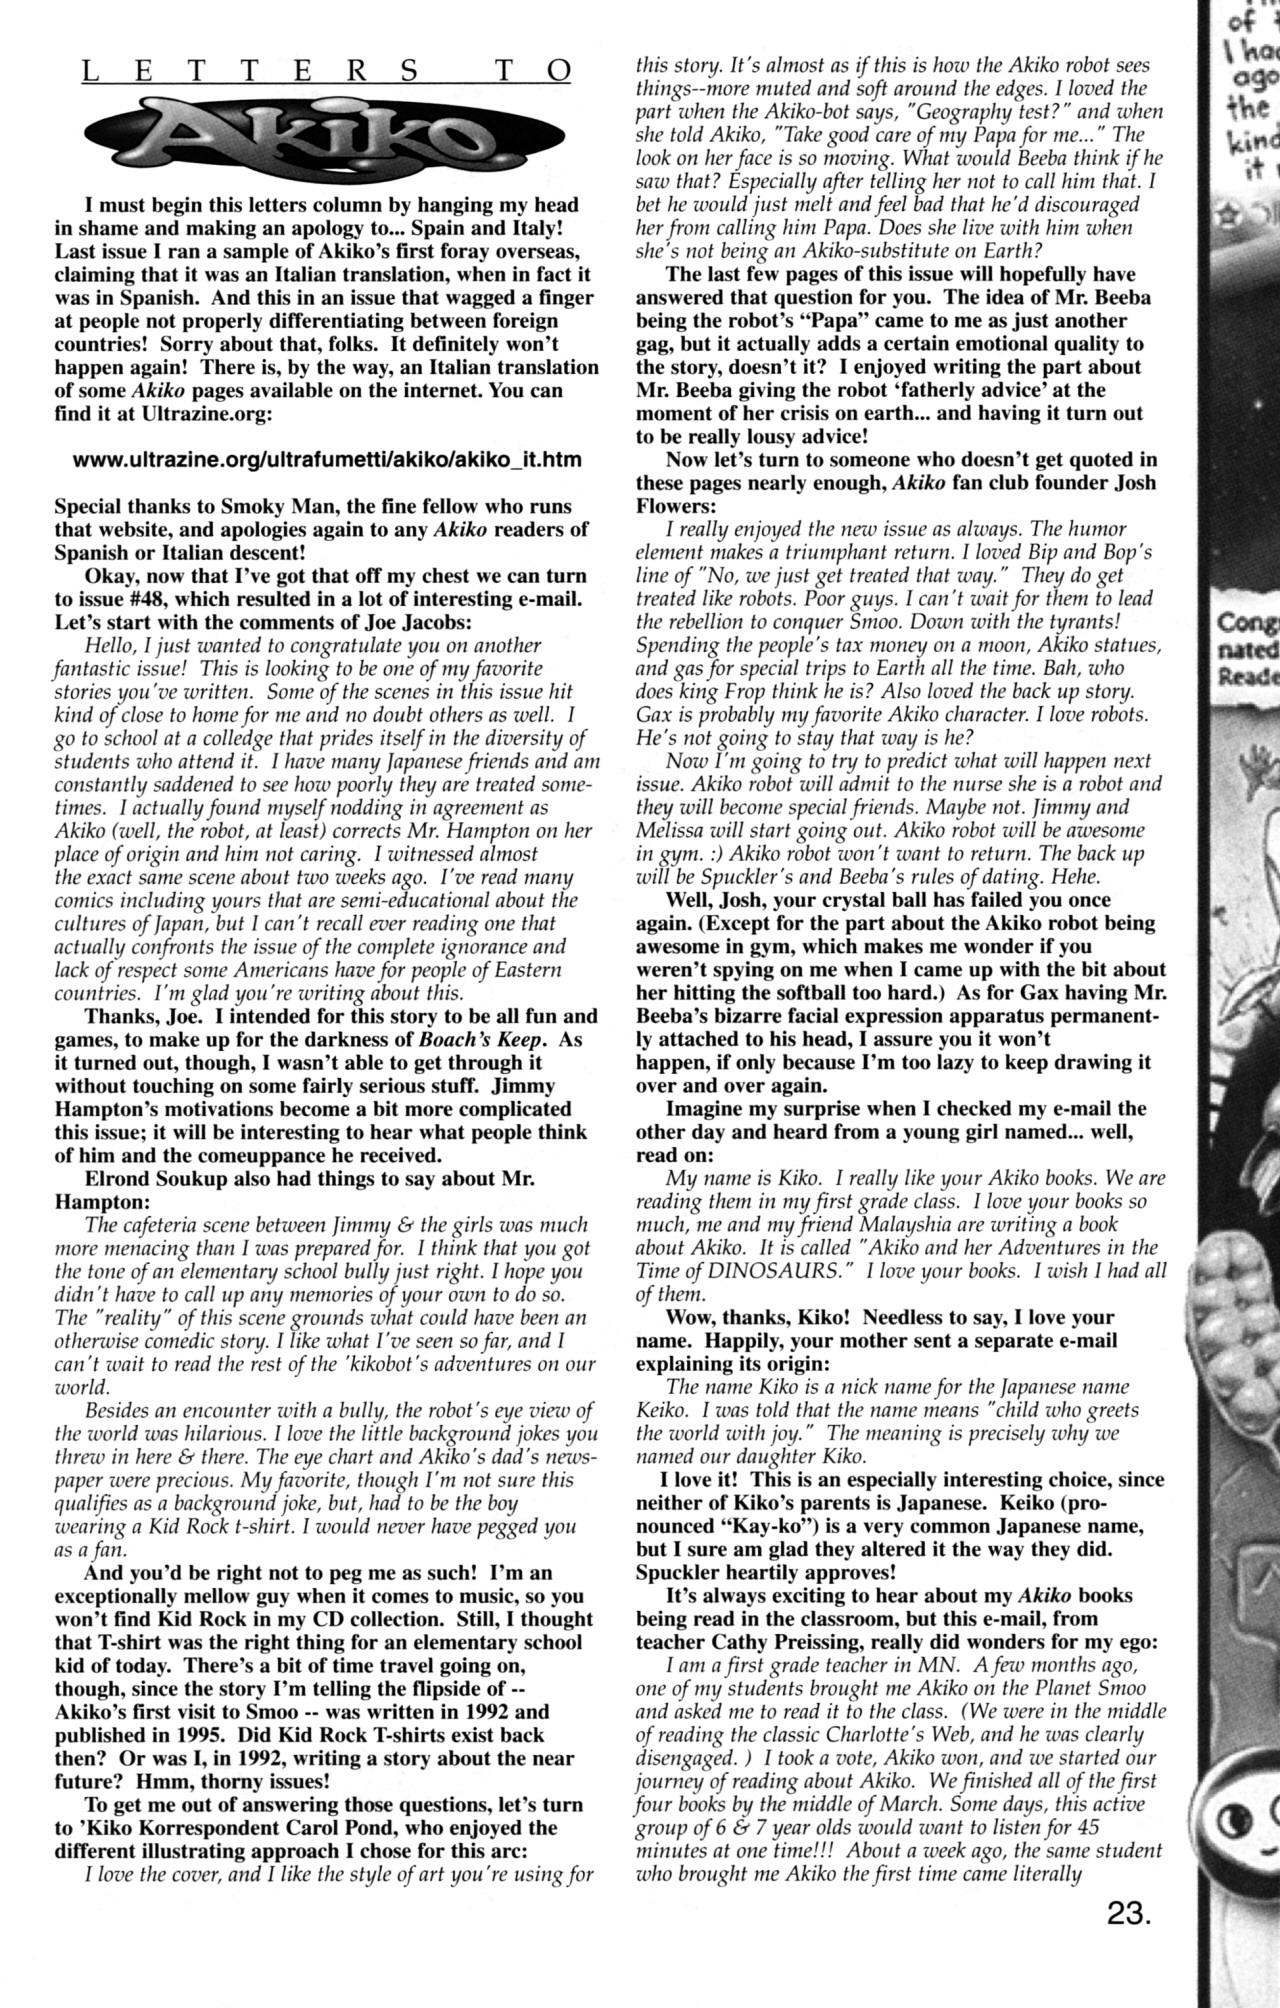 Read online Akiko comic -  Issue #49 - 15